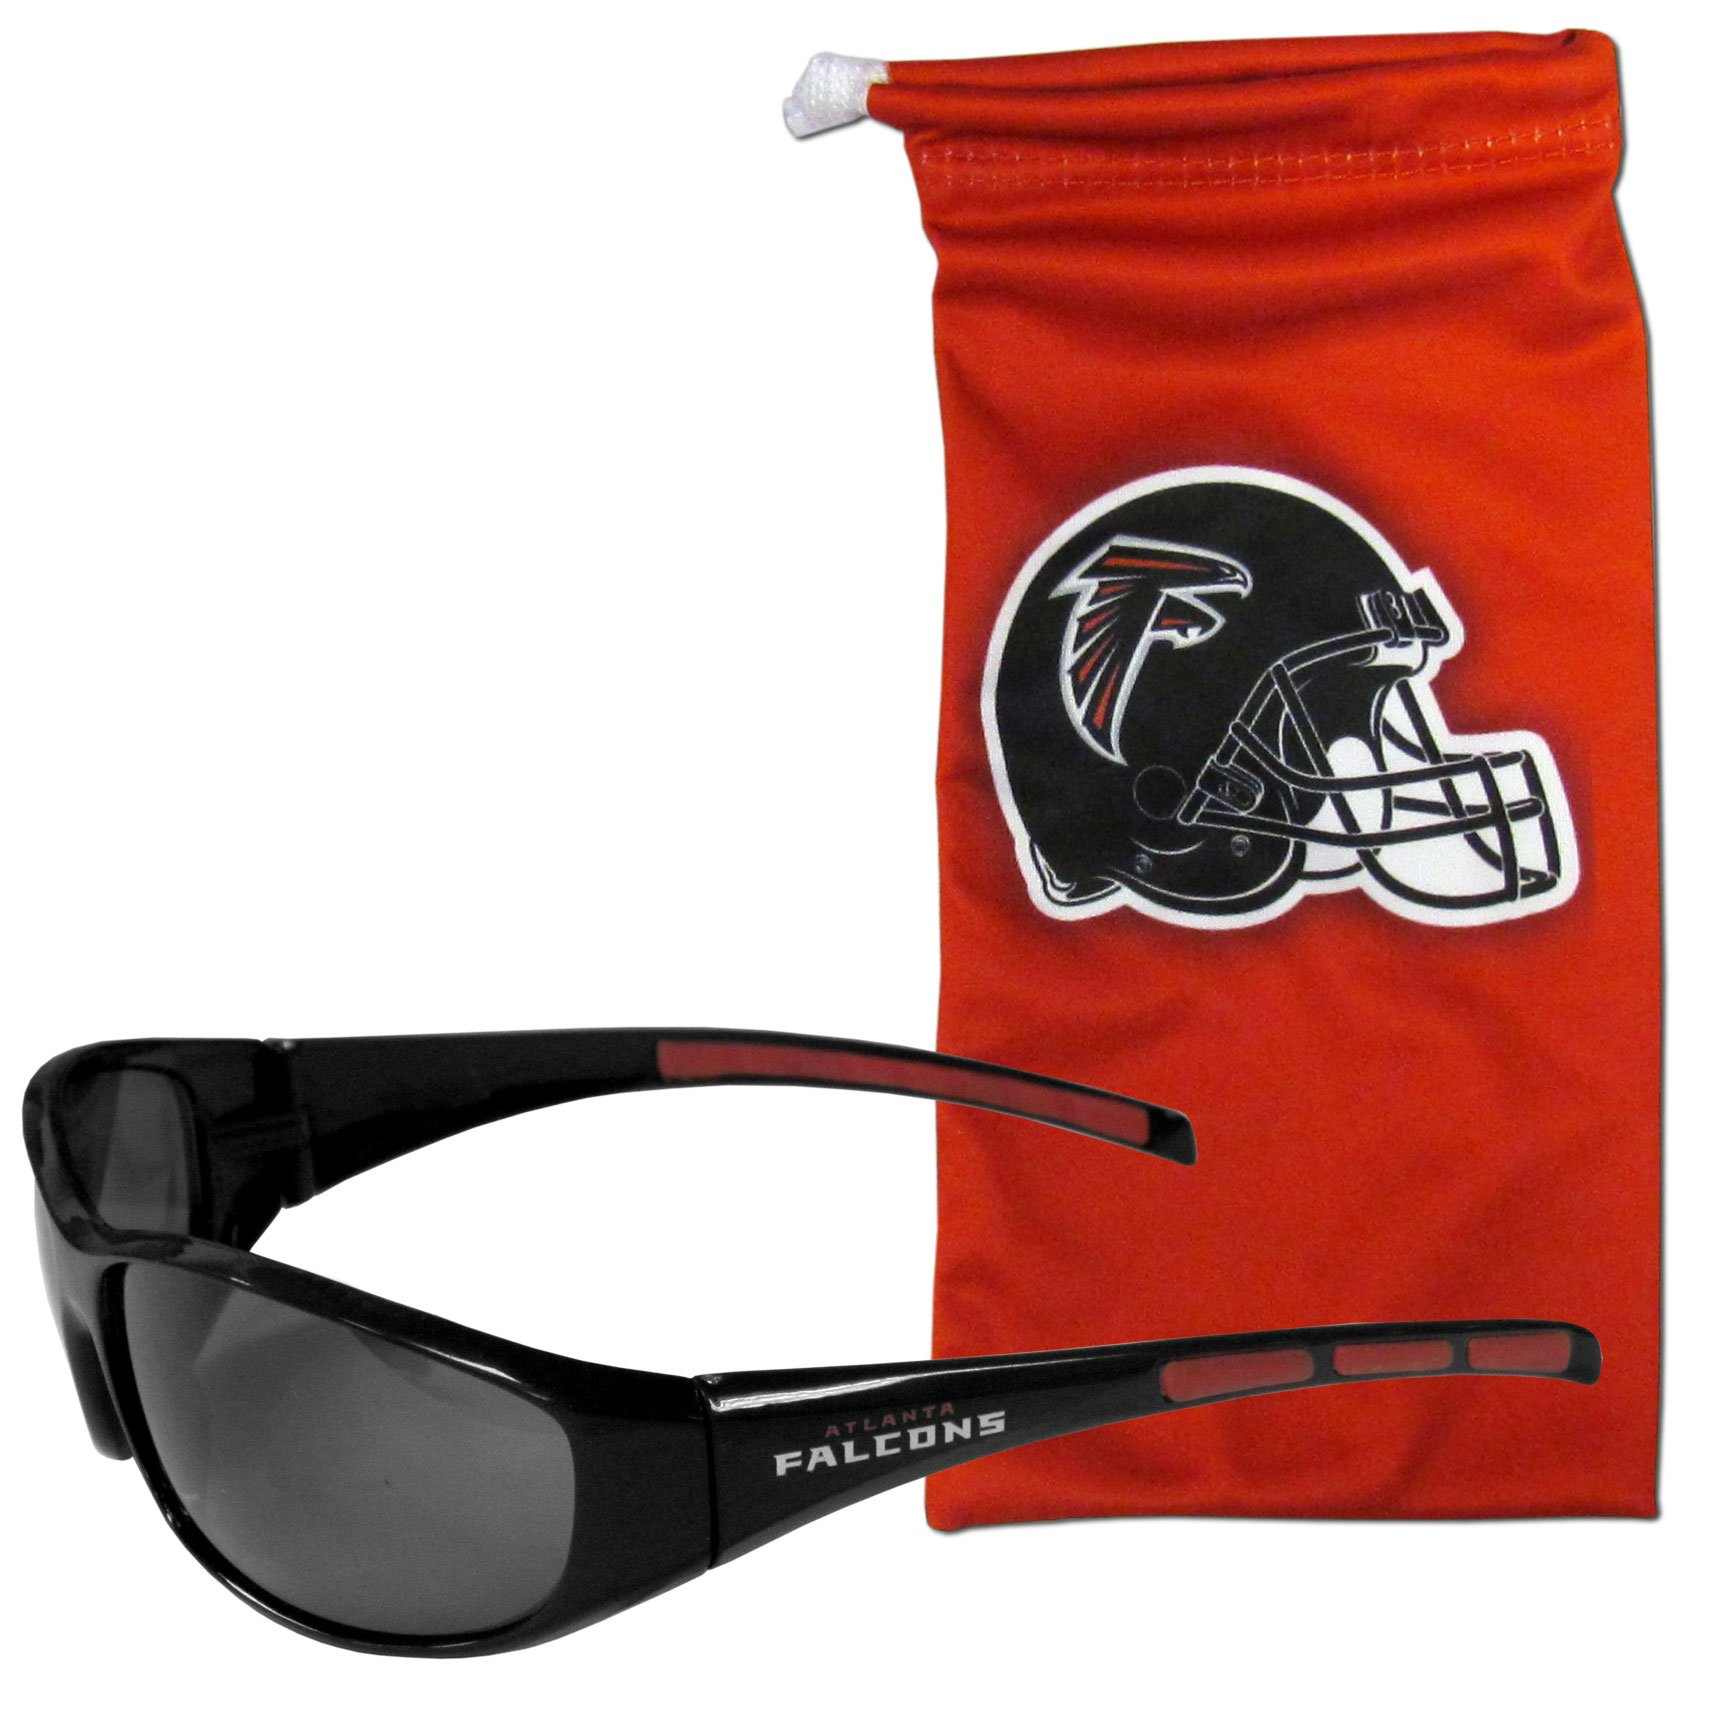 NFL Atlanta Falcons Adult Sunglass and Bag Set, Red